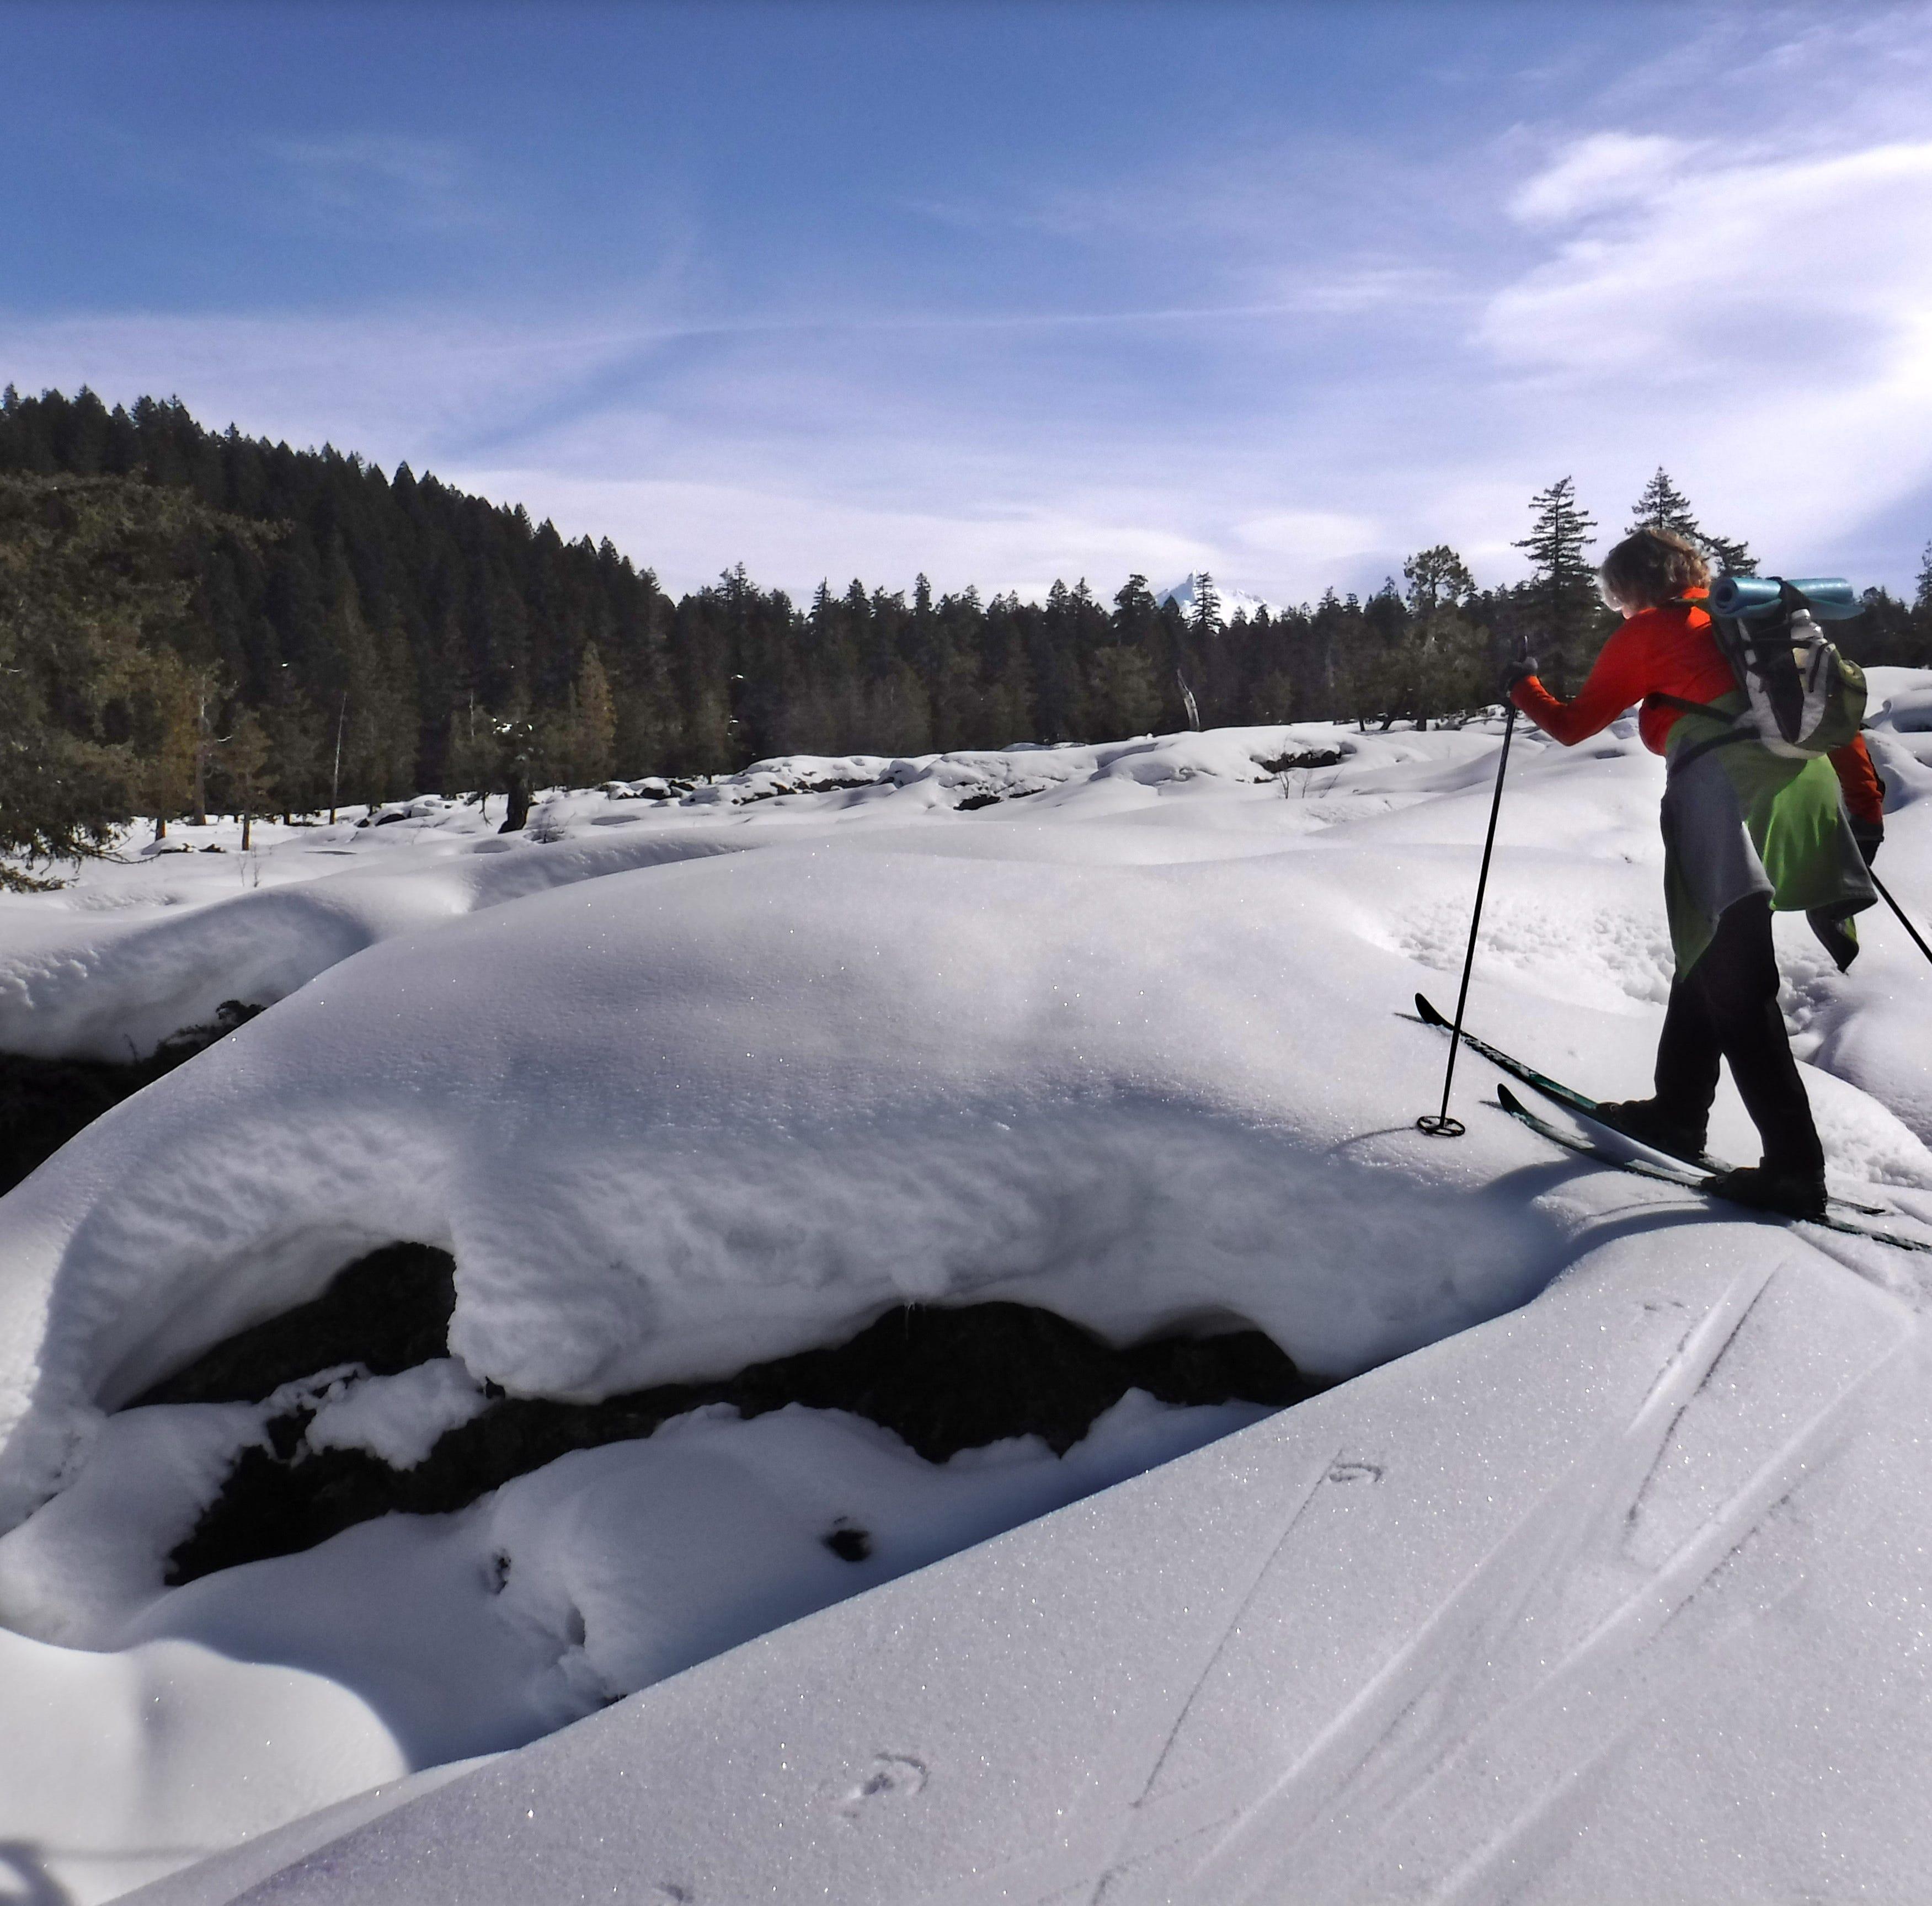 Skiing On Lava:The Mt. Washington Wilderness in winter